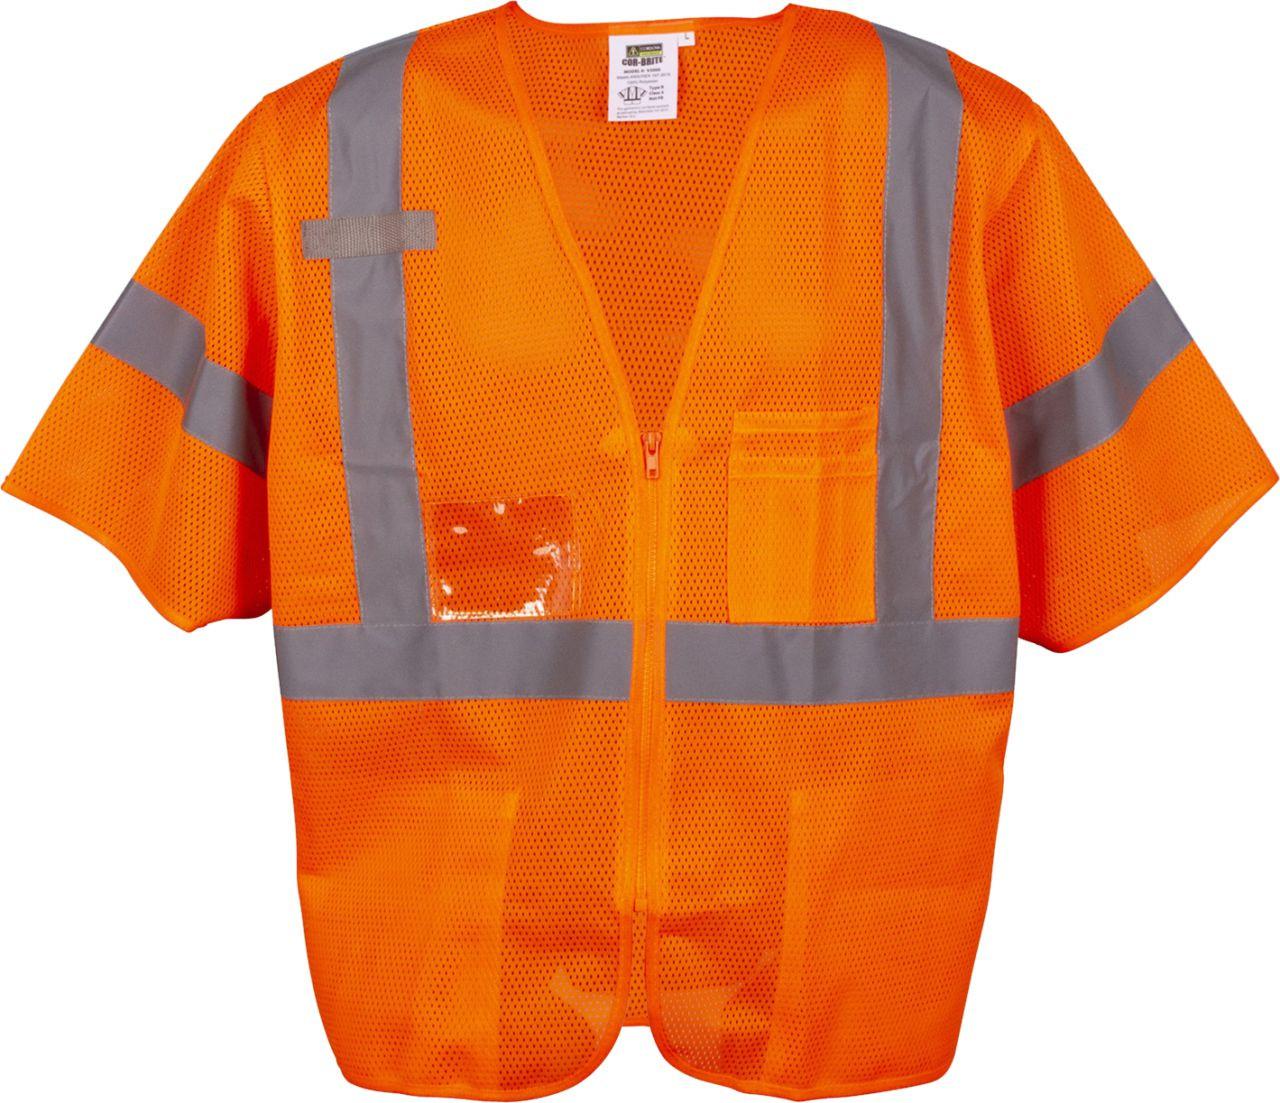 Safety Orange Safety Vest with Zipper Closure 3 Pockets